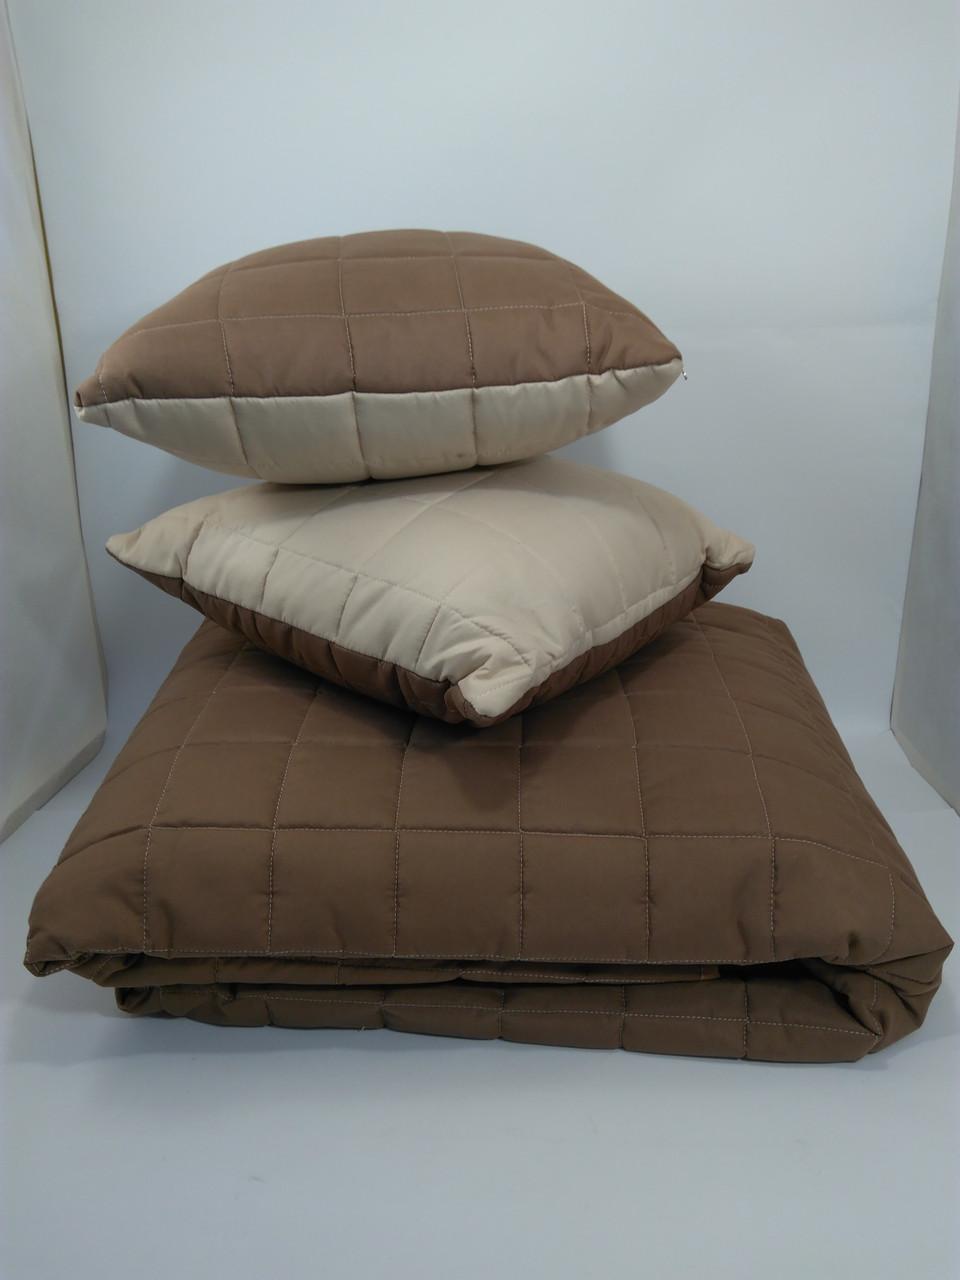 Покрывало двустороннее стеганое 160*220 + подушки ОДА